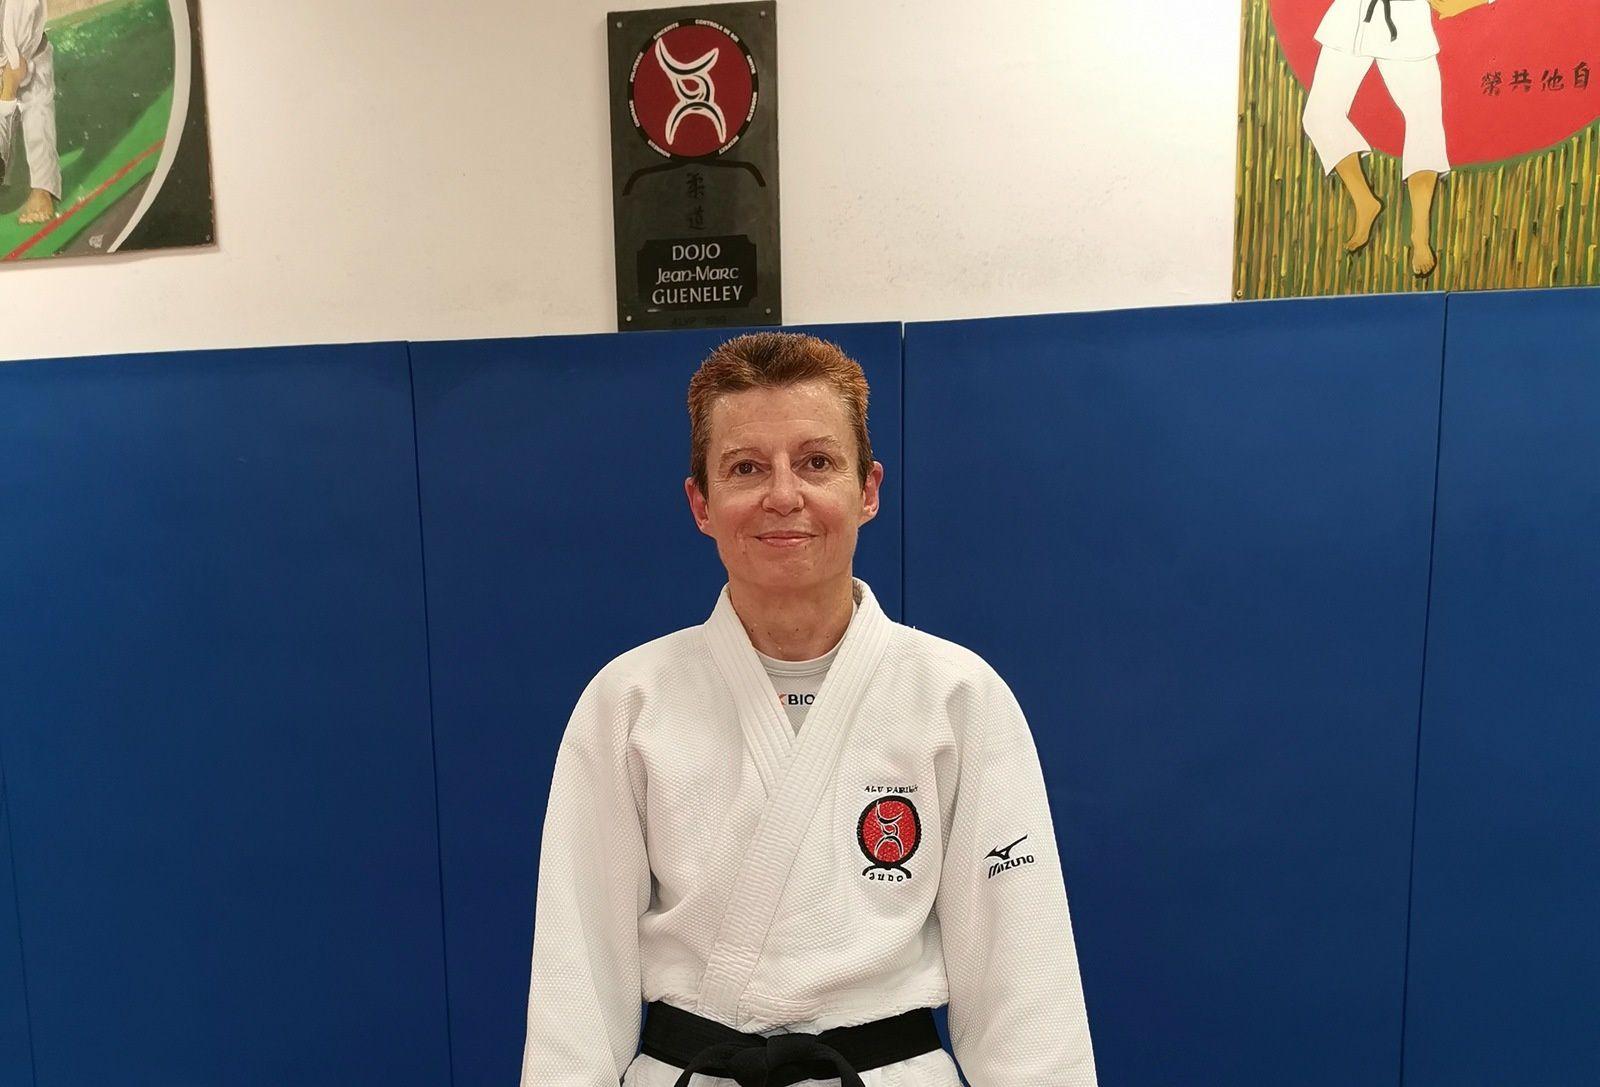 Martine Filiptchenko (ALVP Judo) medaillée de bronze aux Mondiaux masters